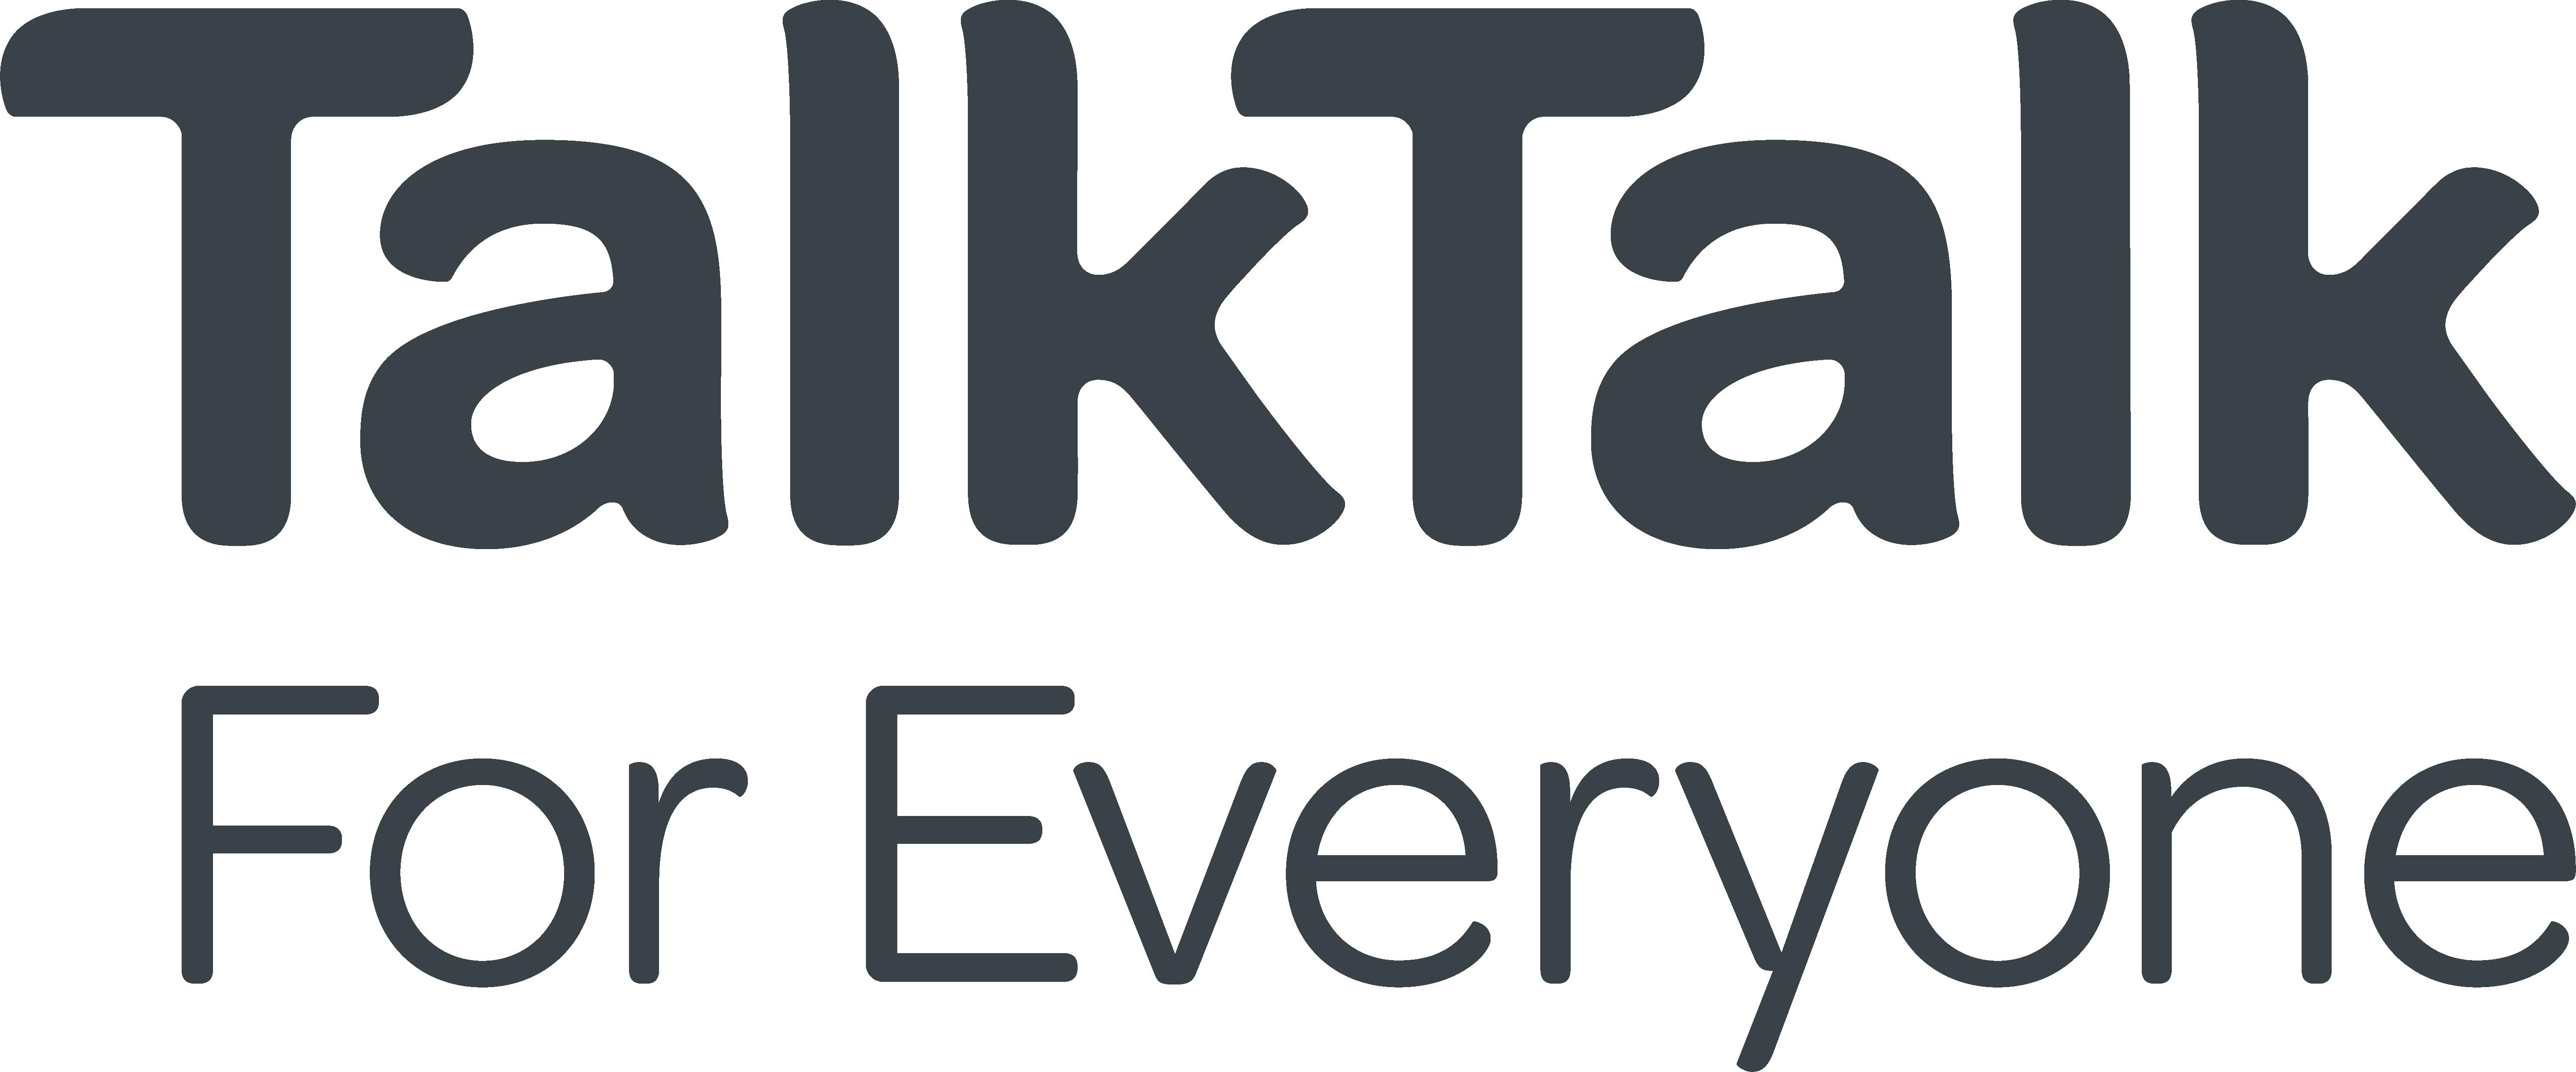 Fix slow broadband speeds - TalkTalk Help & Support